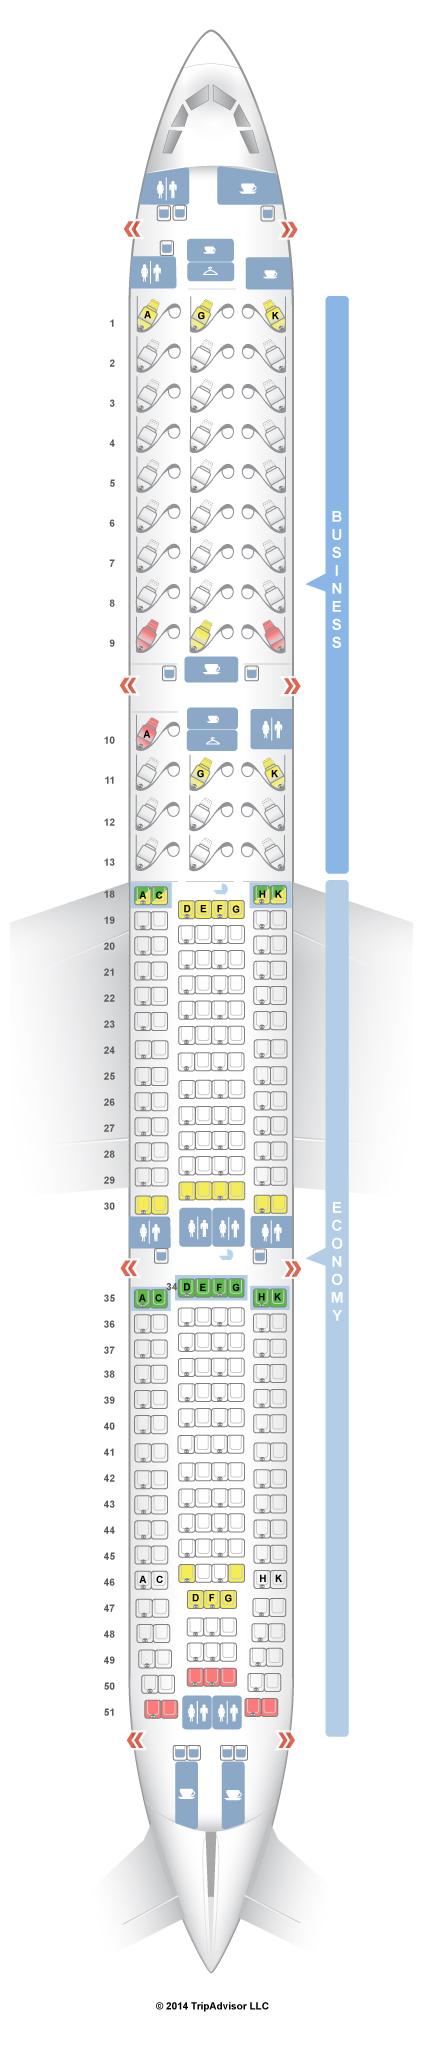 cathay pacific 333 seat map Seatguru Seat Map Air Canada Airbus A330 300 333 Seatguru cathay pacific 333 seat map